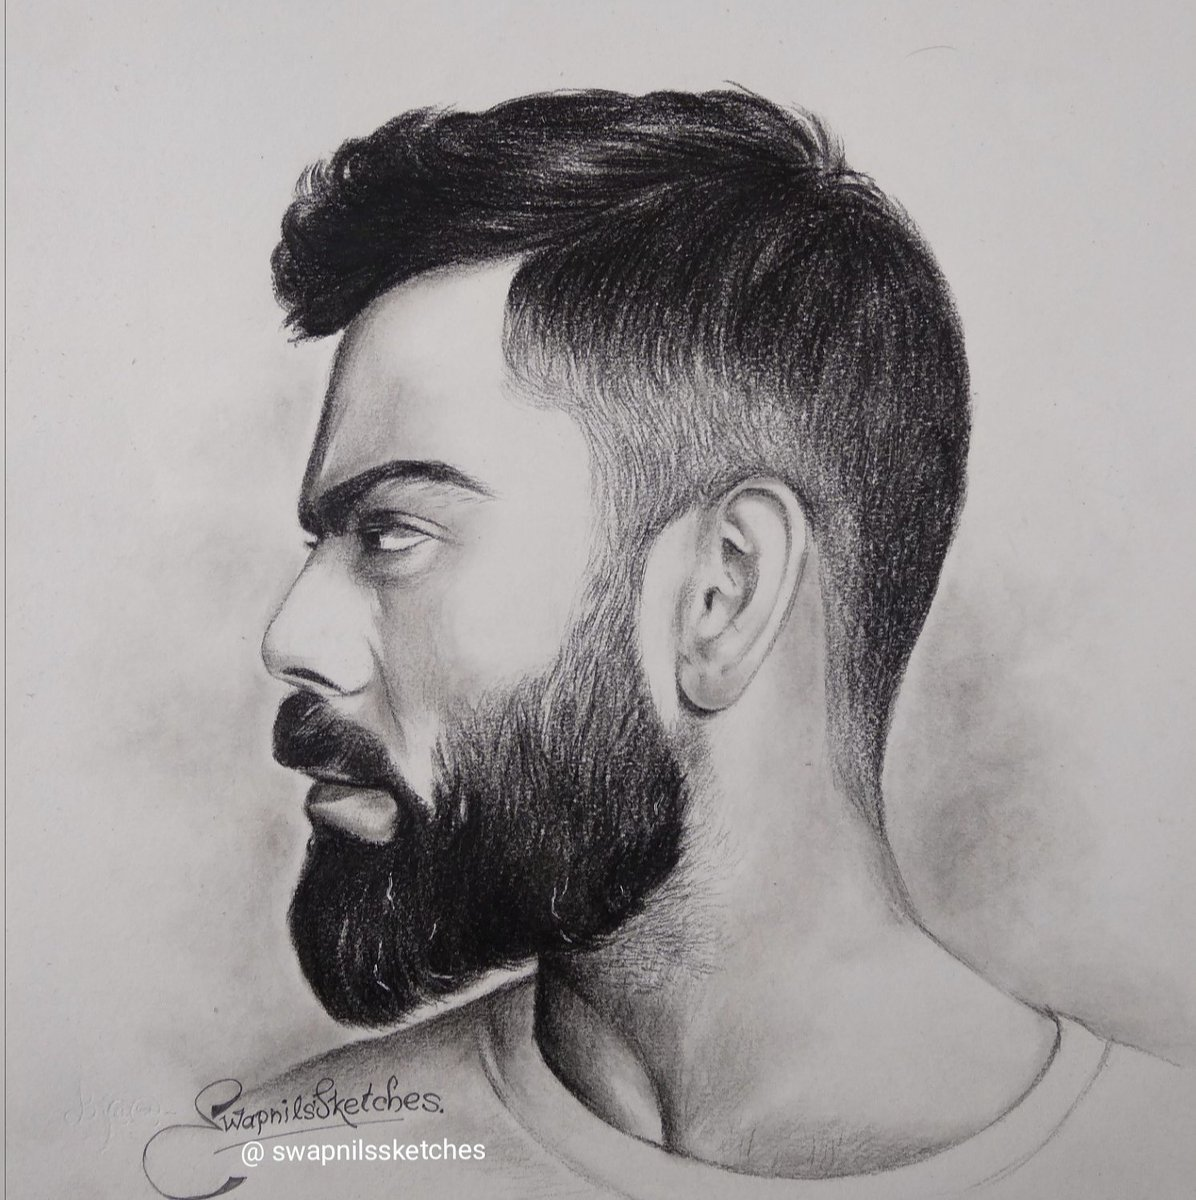 @imVkohli Your sketch by me champ.,💕🥰